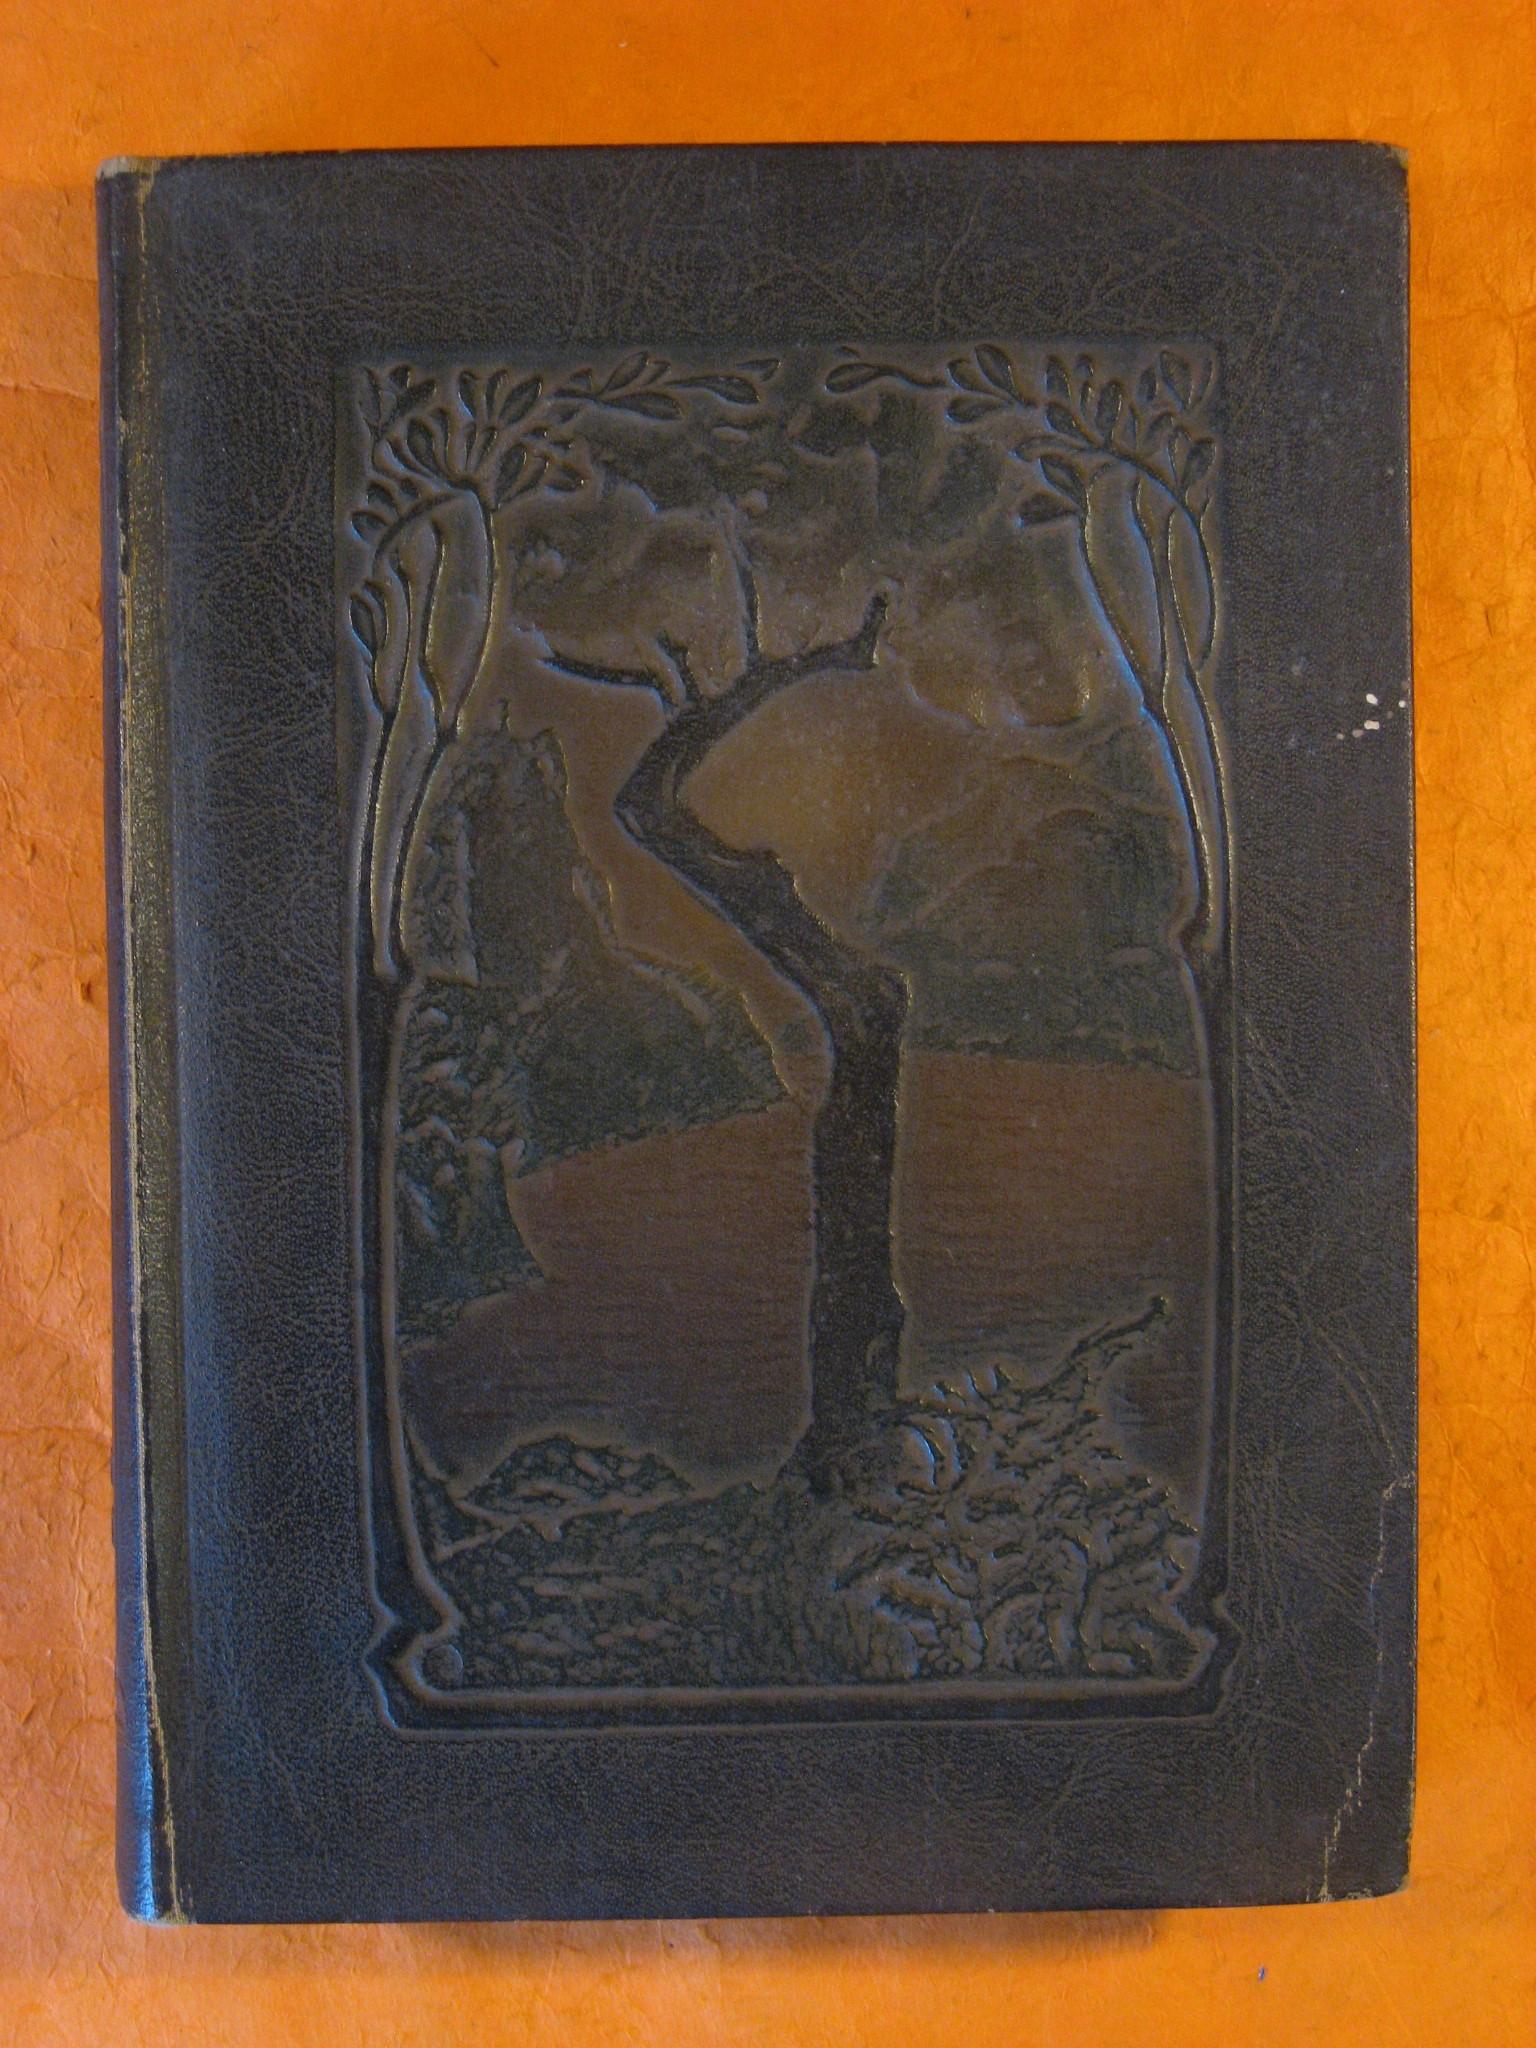 Little Journeys to the Homes of the Great Eminent Orators - Memorial Edition, Hubbard, Elbert